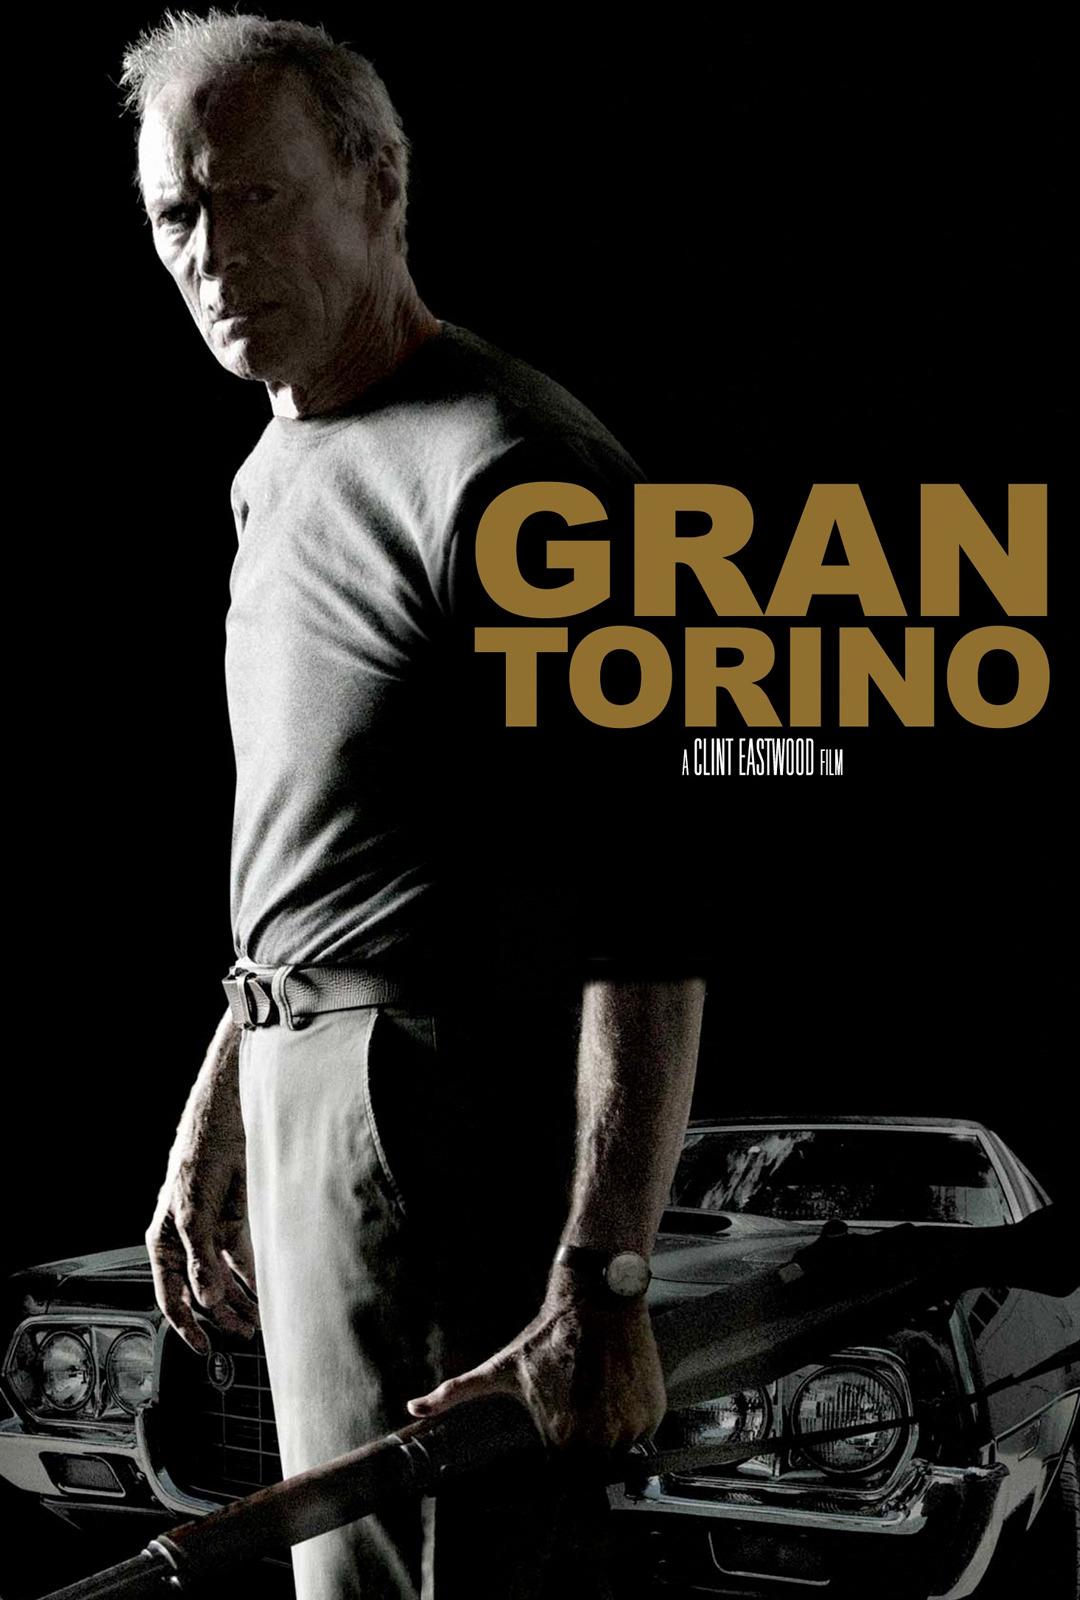 Gran torino and up